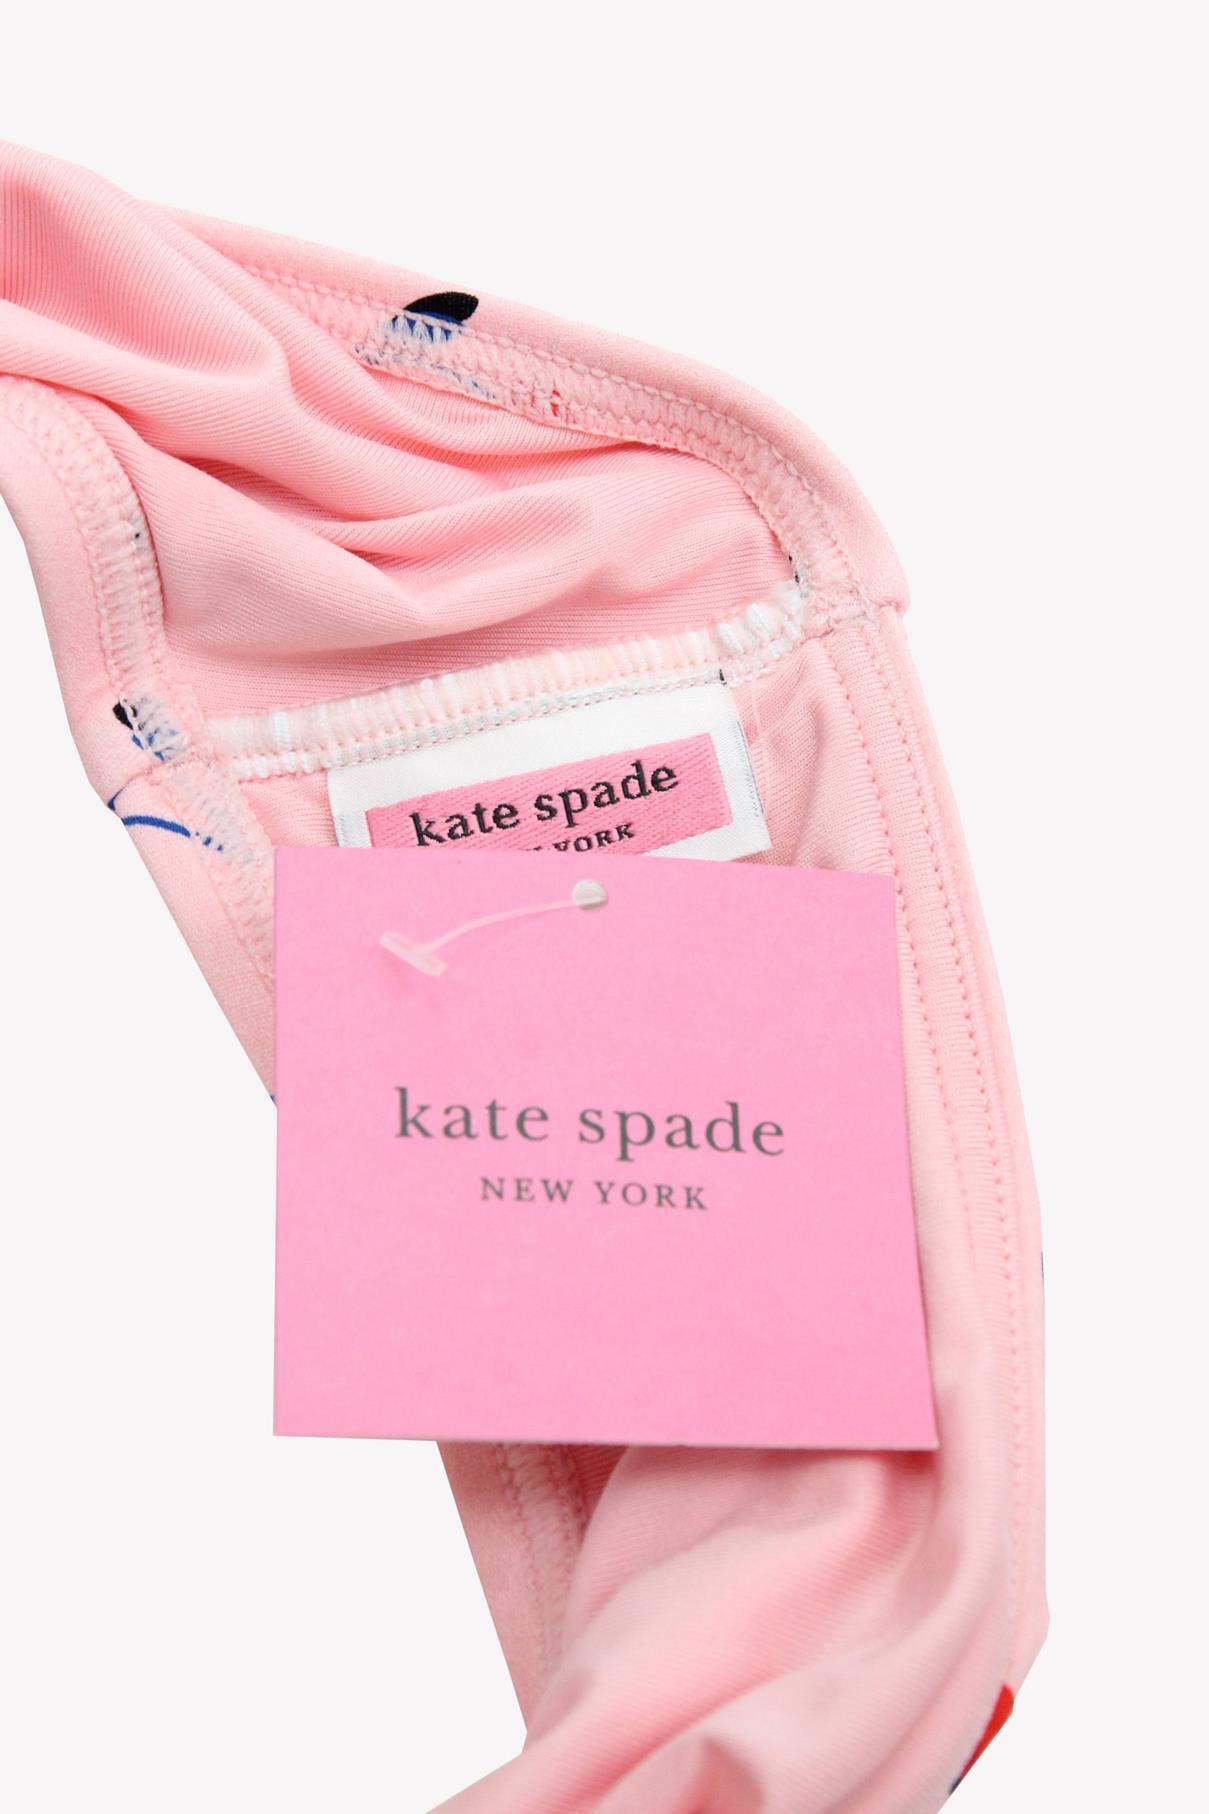 Bikini in Rosa Kate Spade